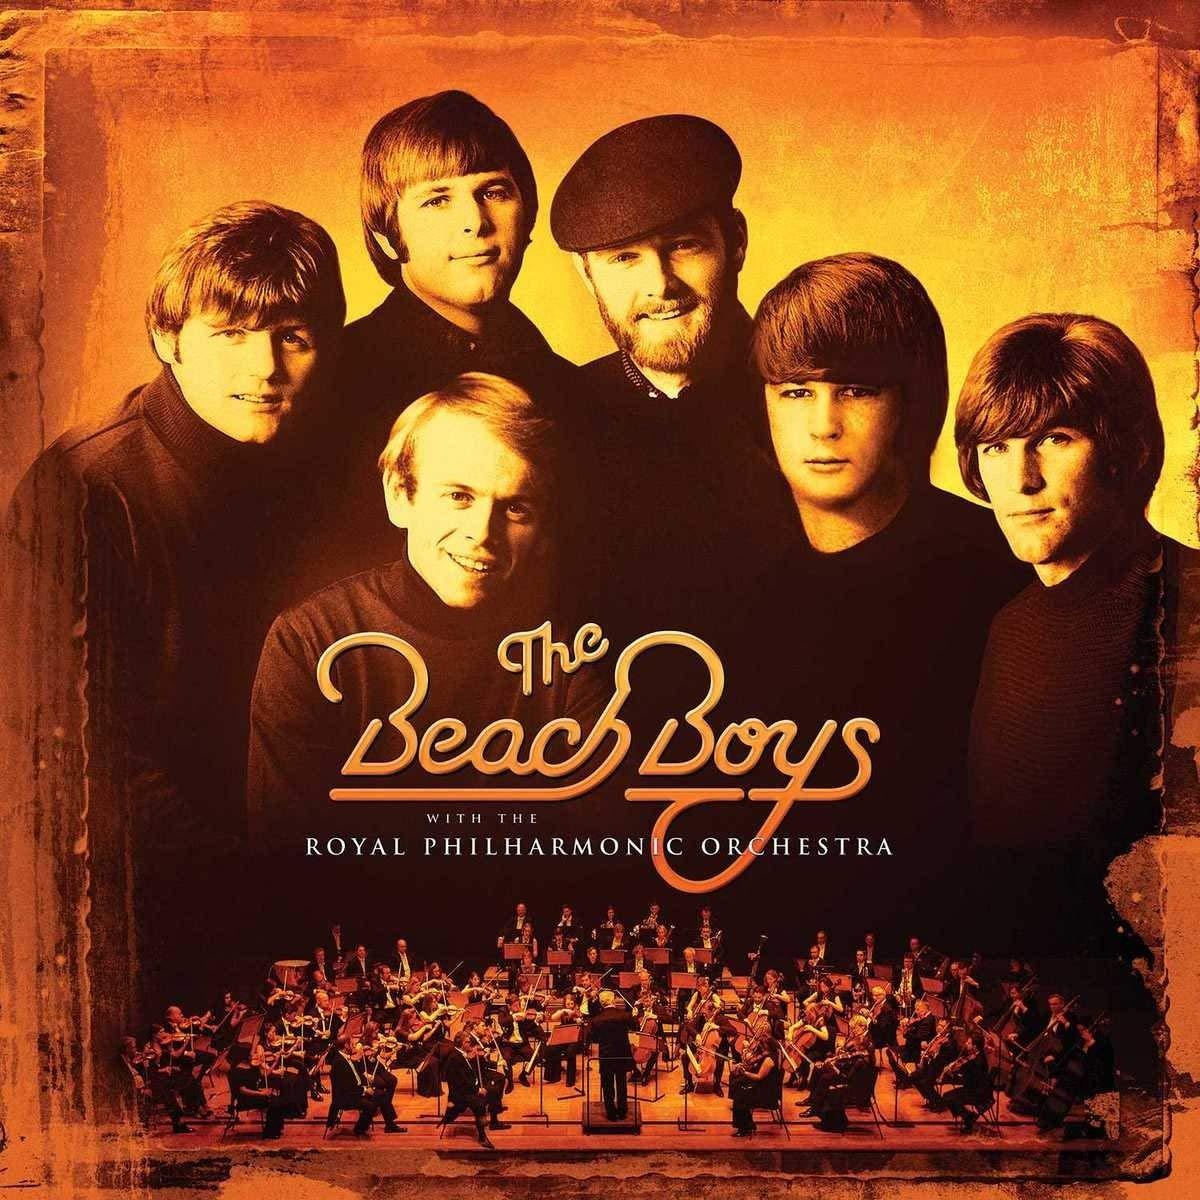 The Beach Boys The Beach Boys. Orchestral With The Royal Philharmonic the beach boys the beach boys greatest surf hits